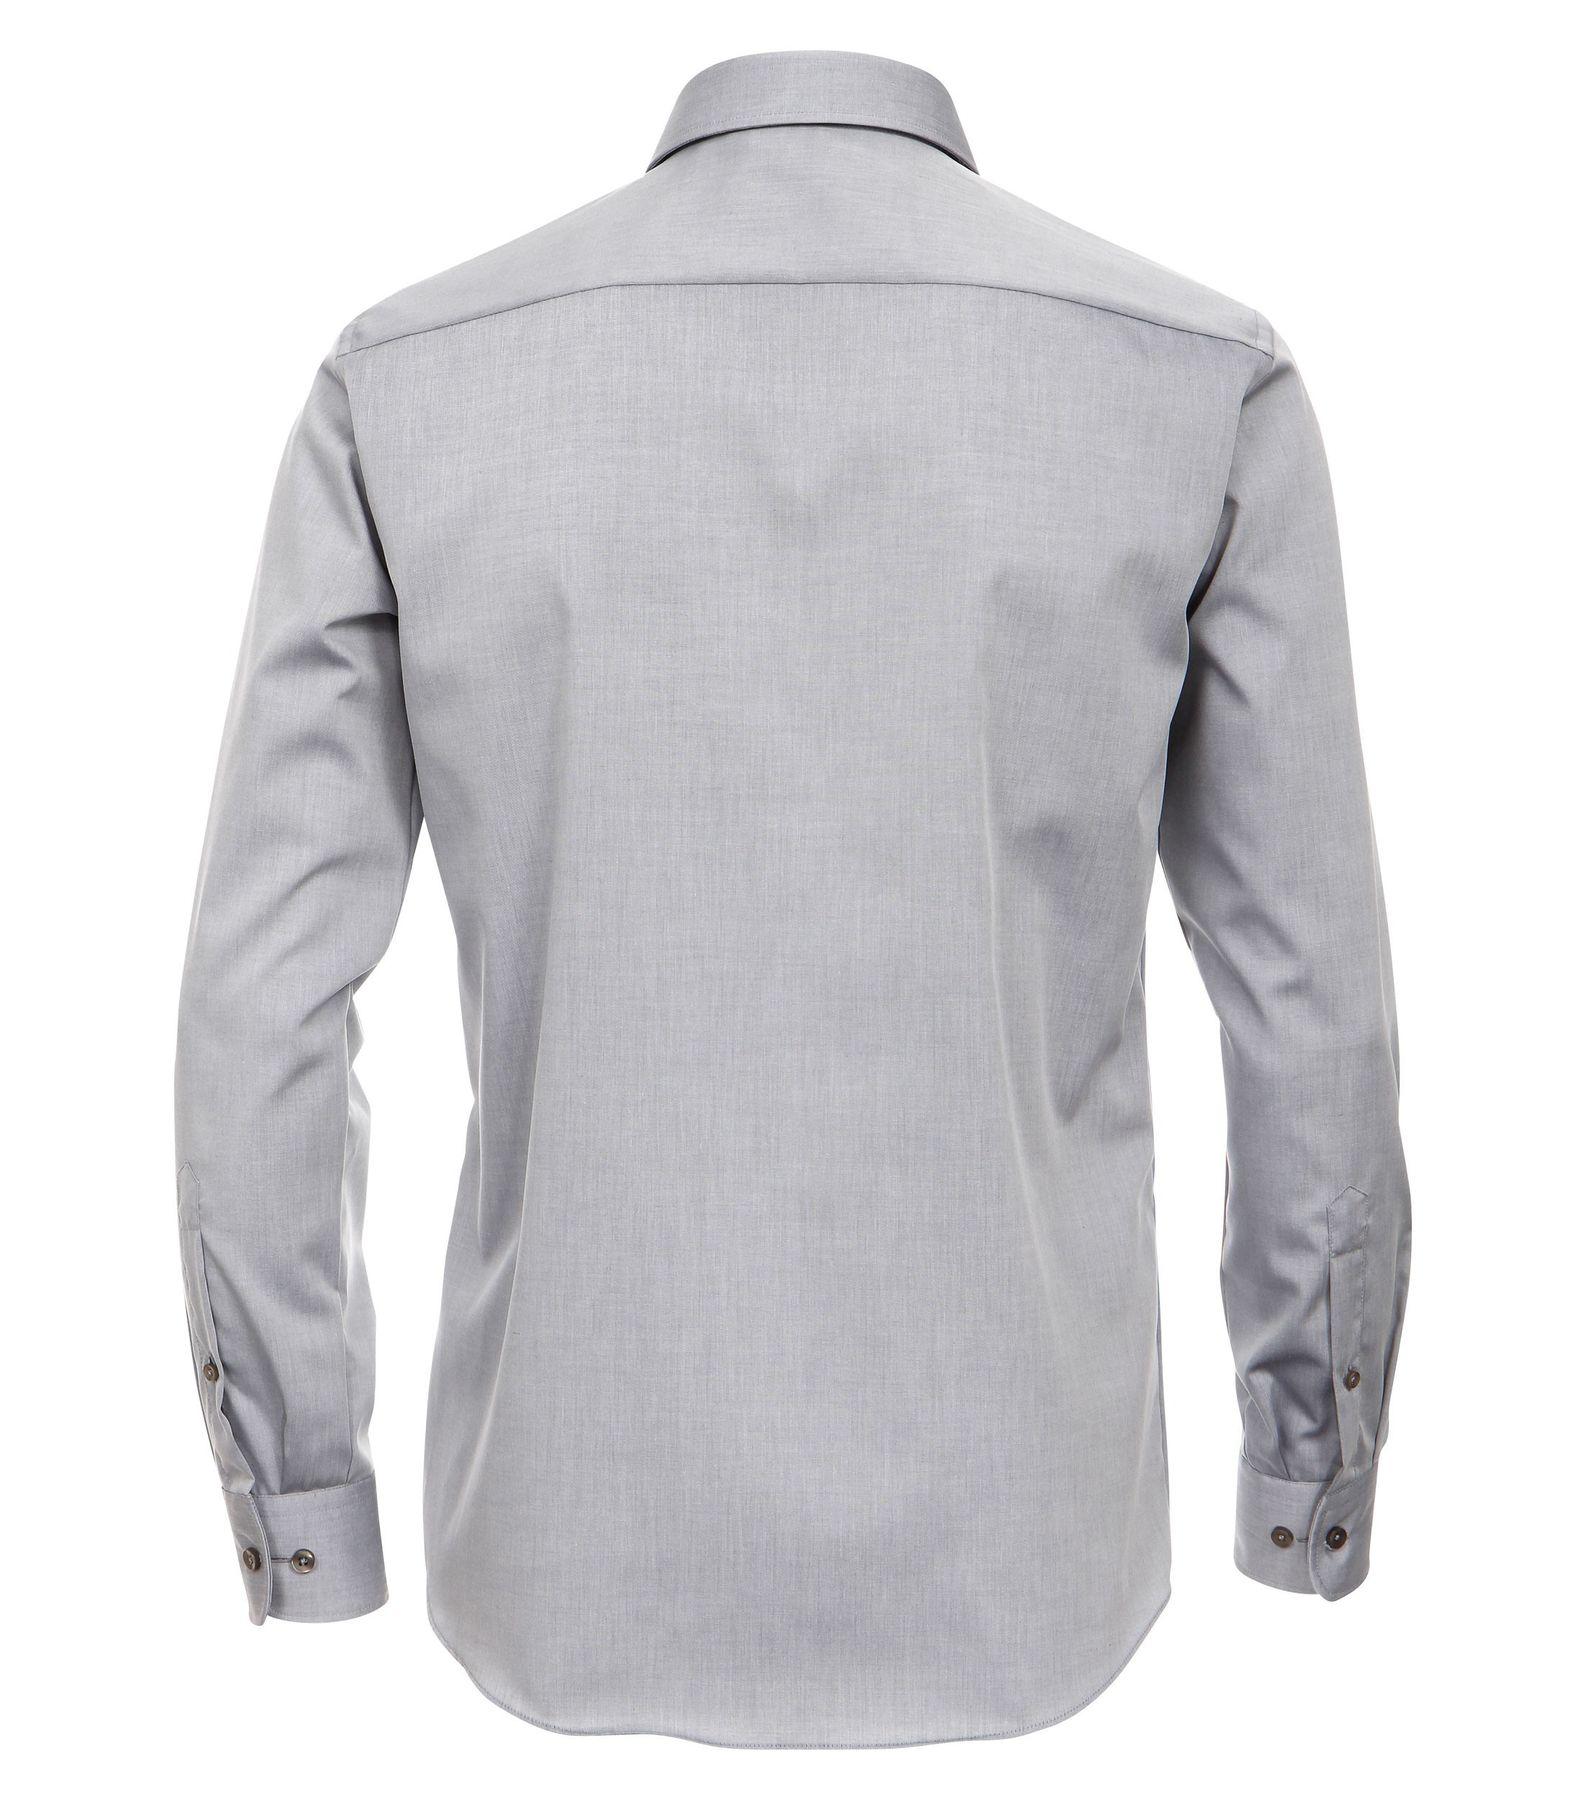 Casamoda - Modern Fit - Bügelfreies Herren Business Langarm Hemd verschiedene Farben (006560A) – Bild 2